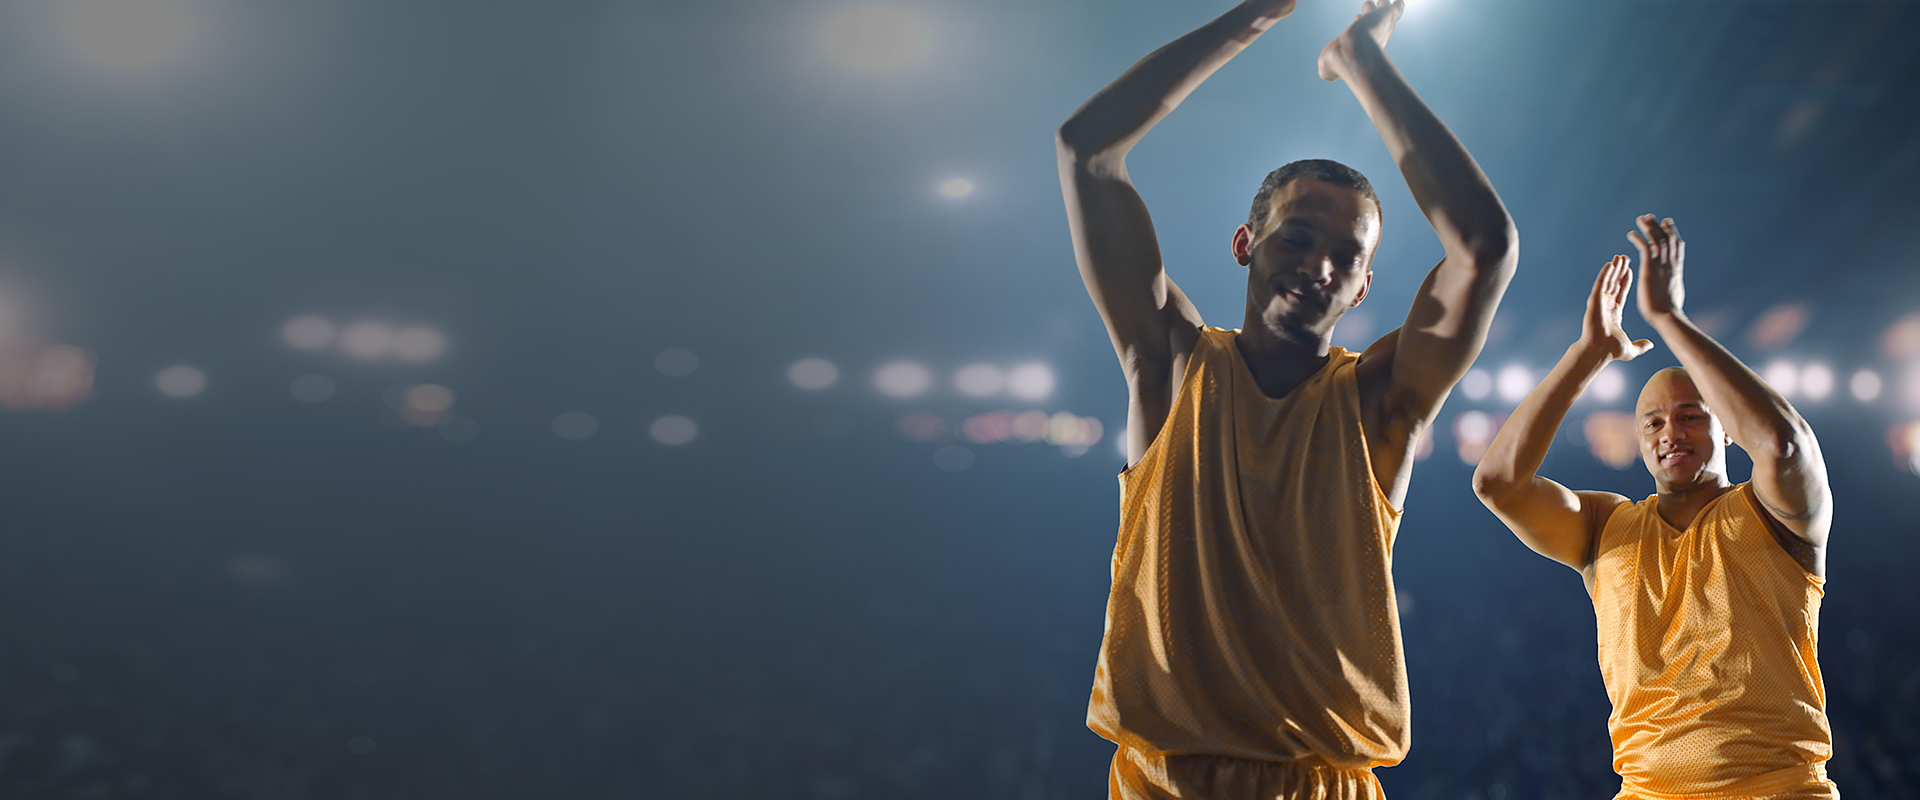 basketball-passion